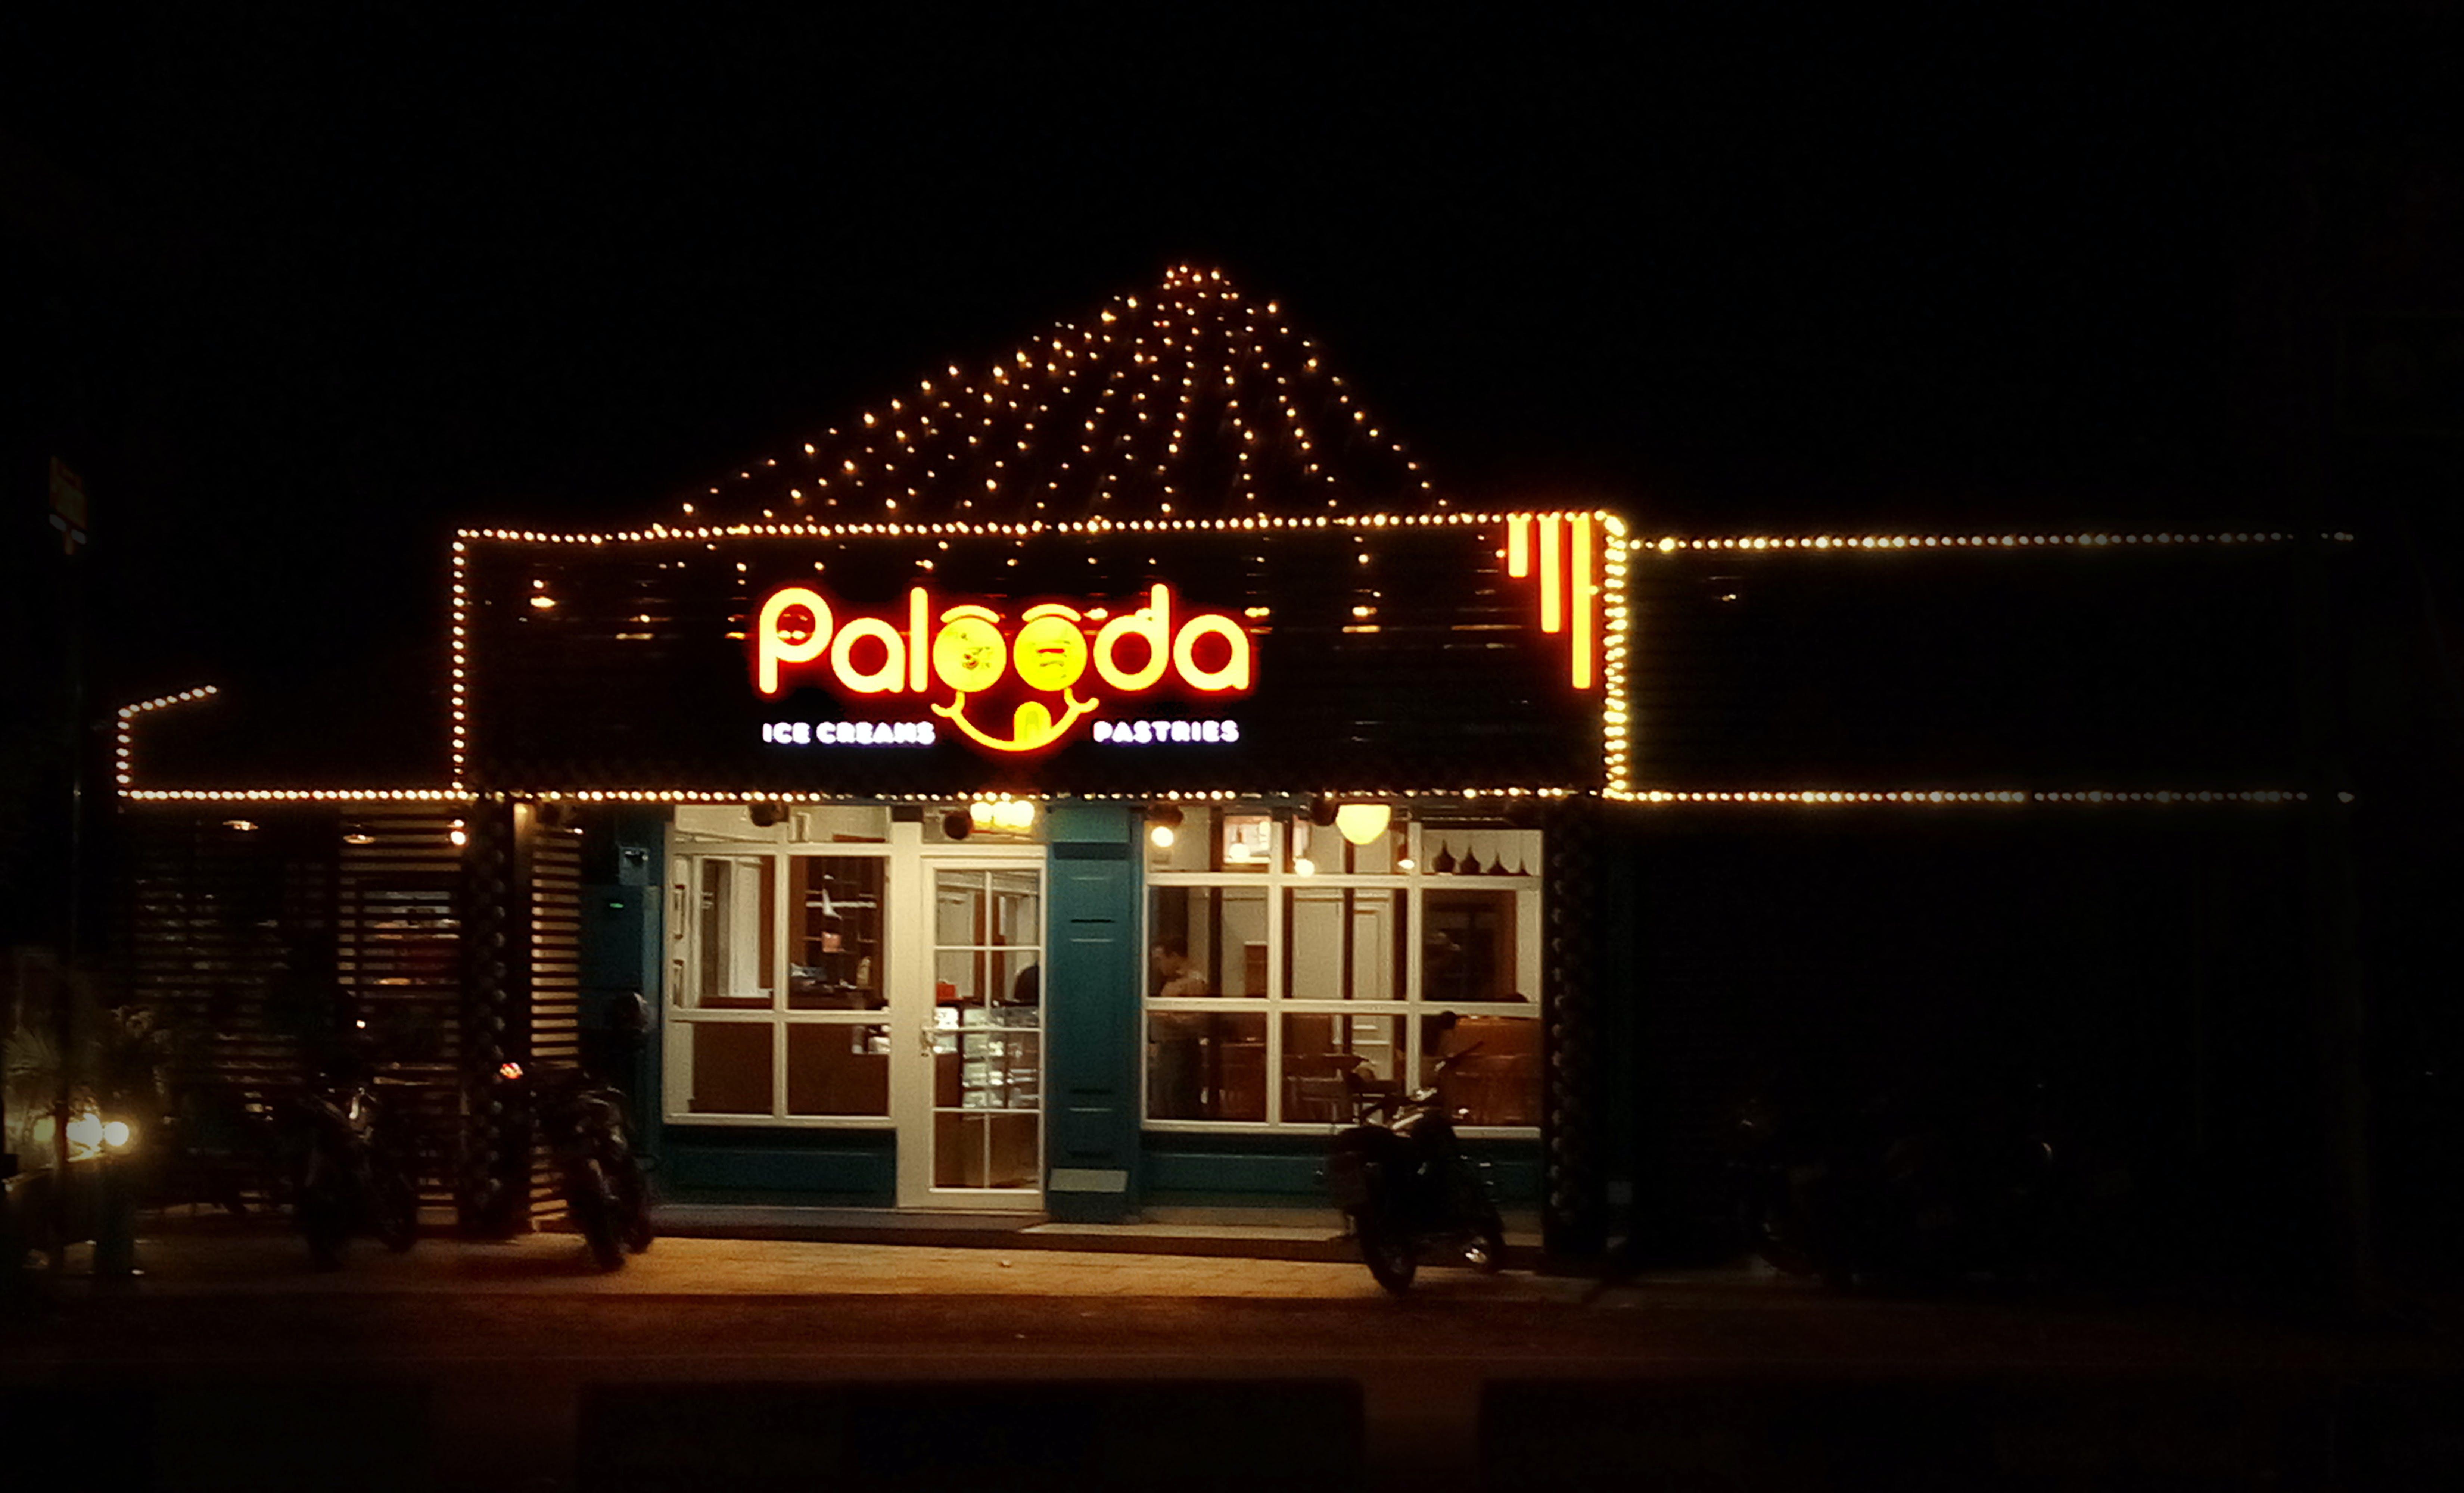 Free stock photo of night lights, night photography, store